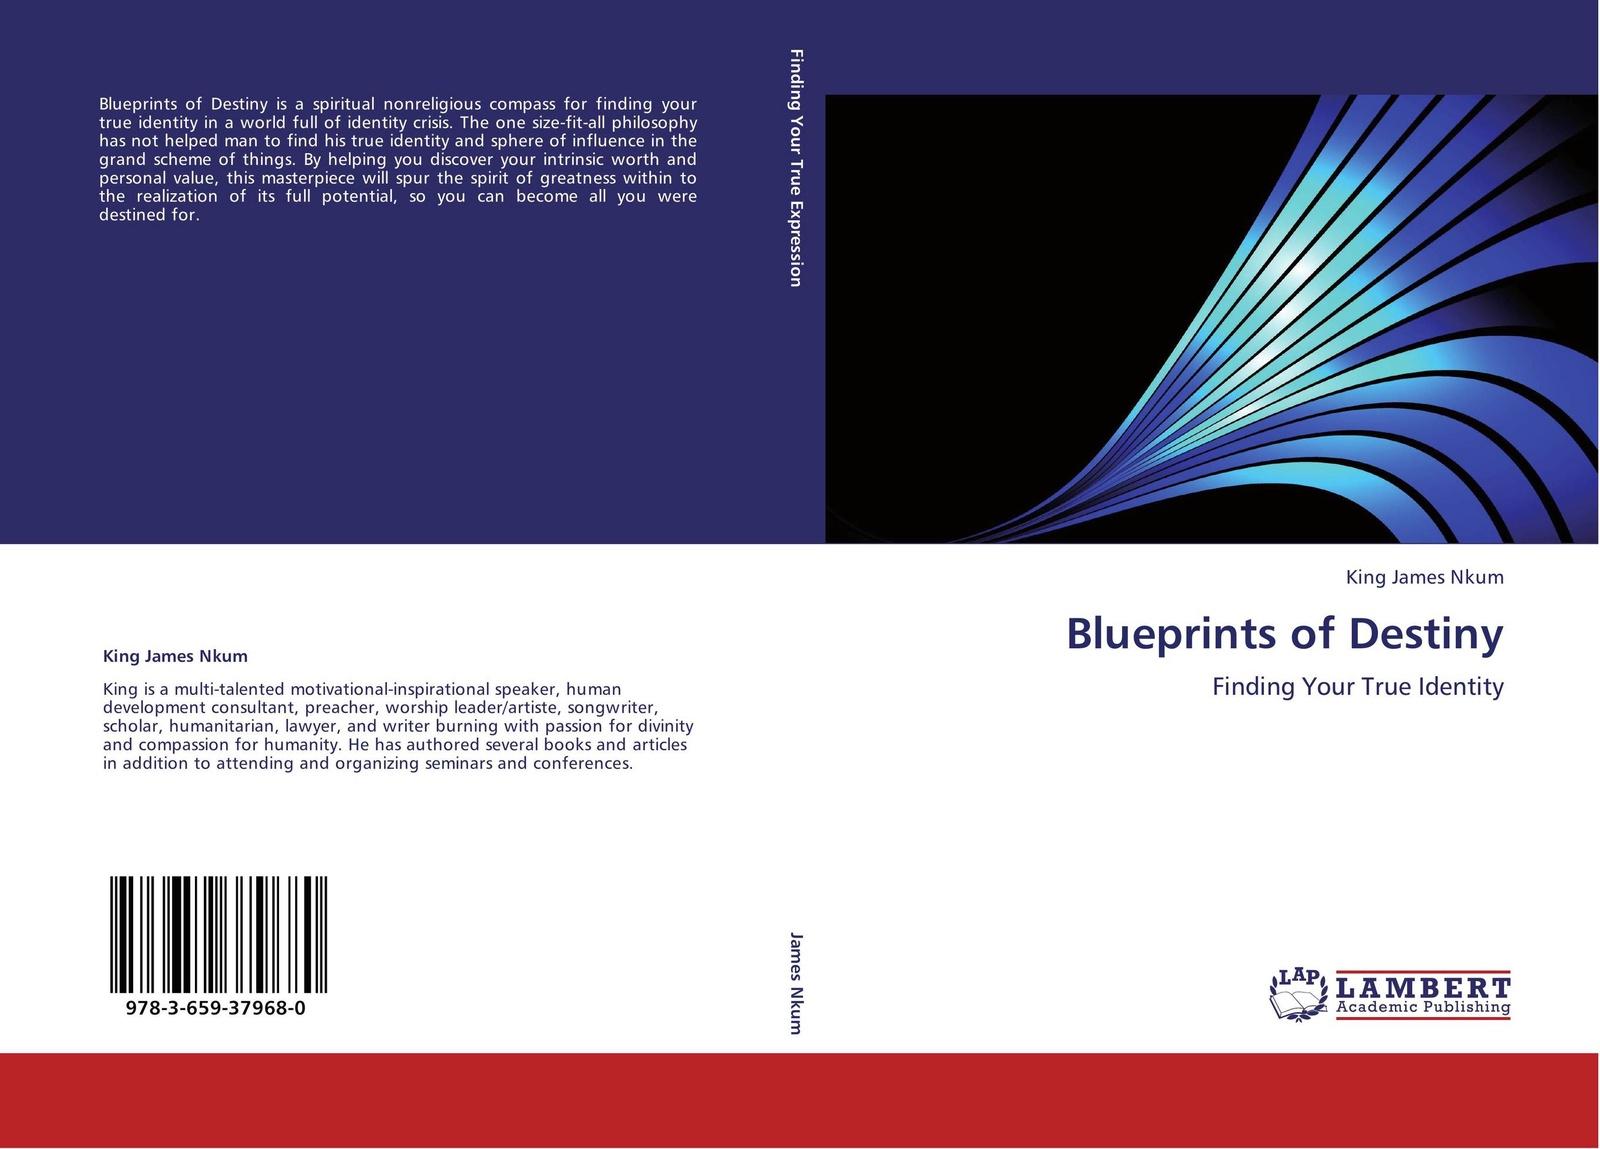 King James Nkum Blueprints of Destiny barbara sinor finding destiny